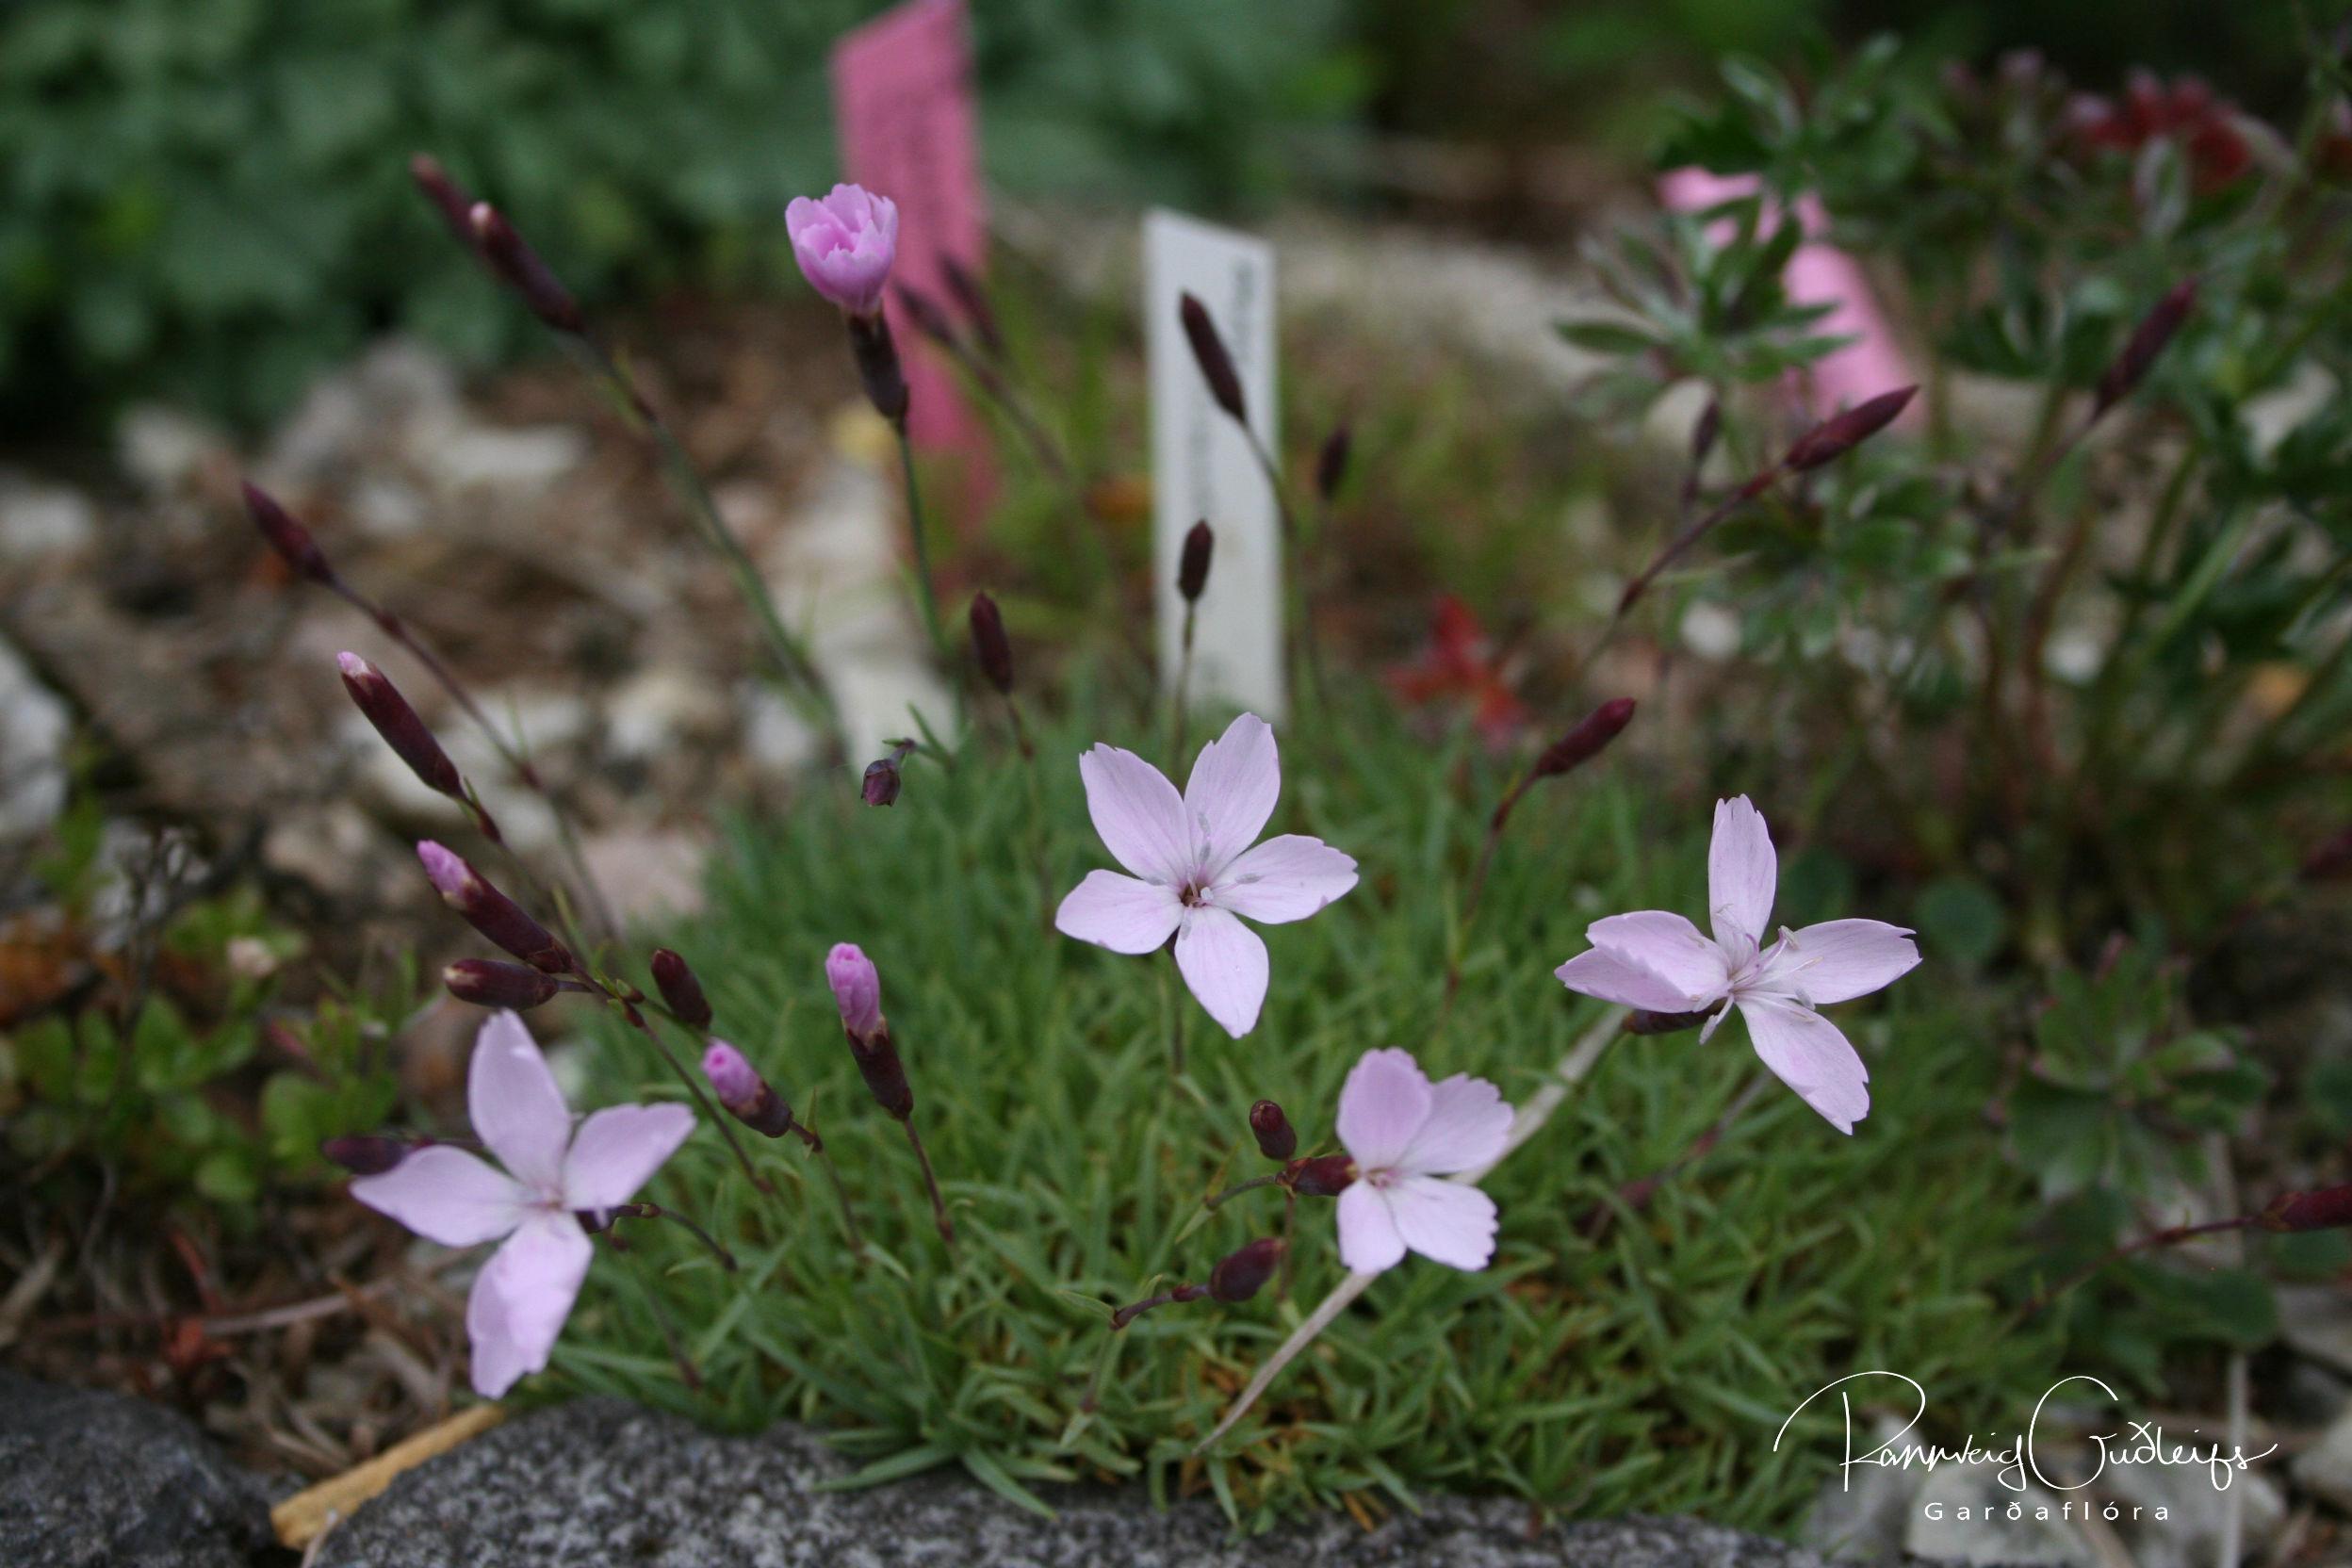 Dianthus freynii